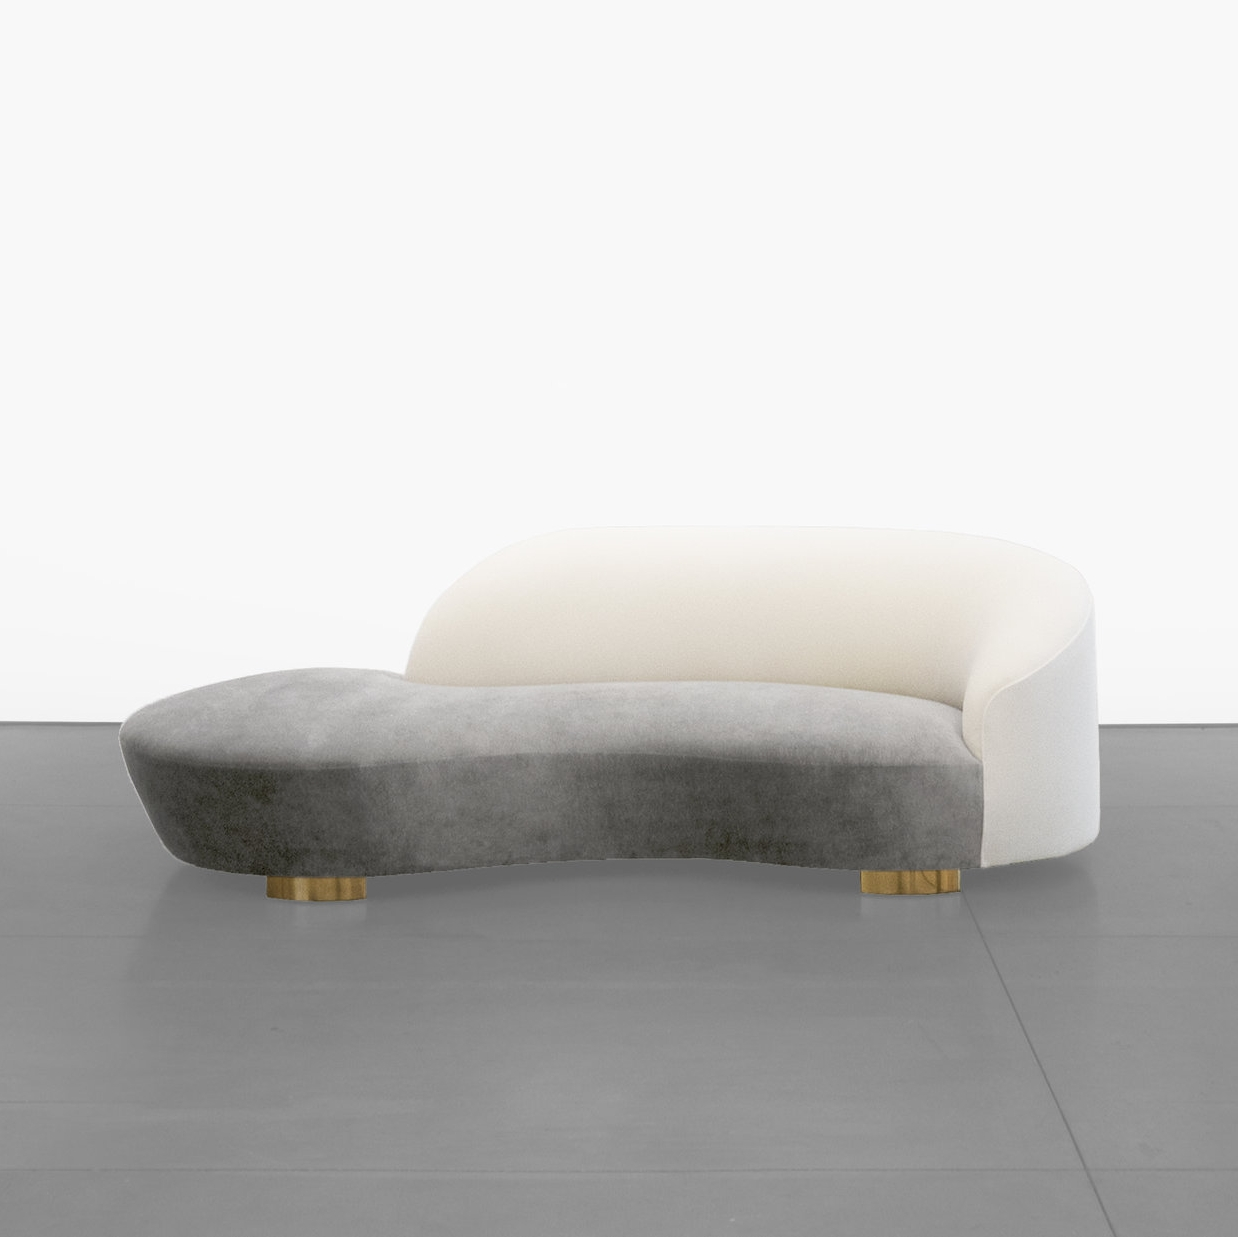 vladimir kagan 'cloud' sofa c. 1970 - 1979 …